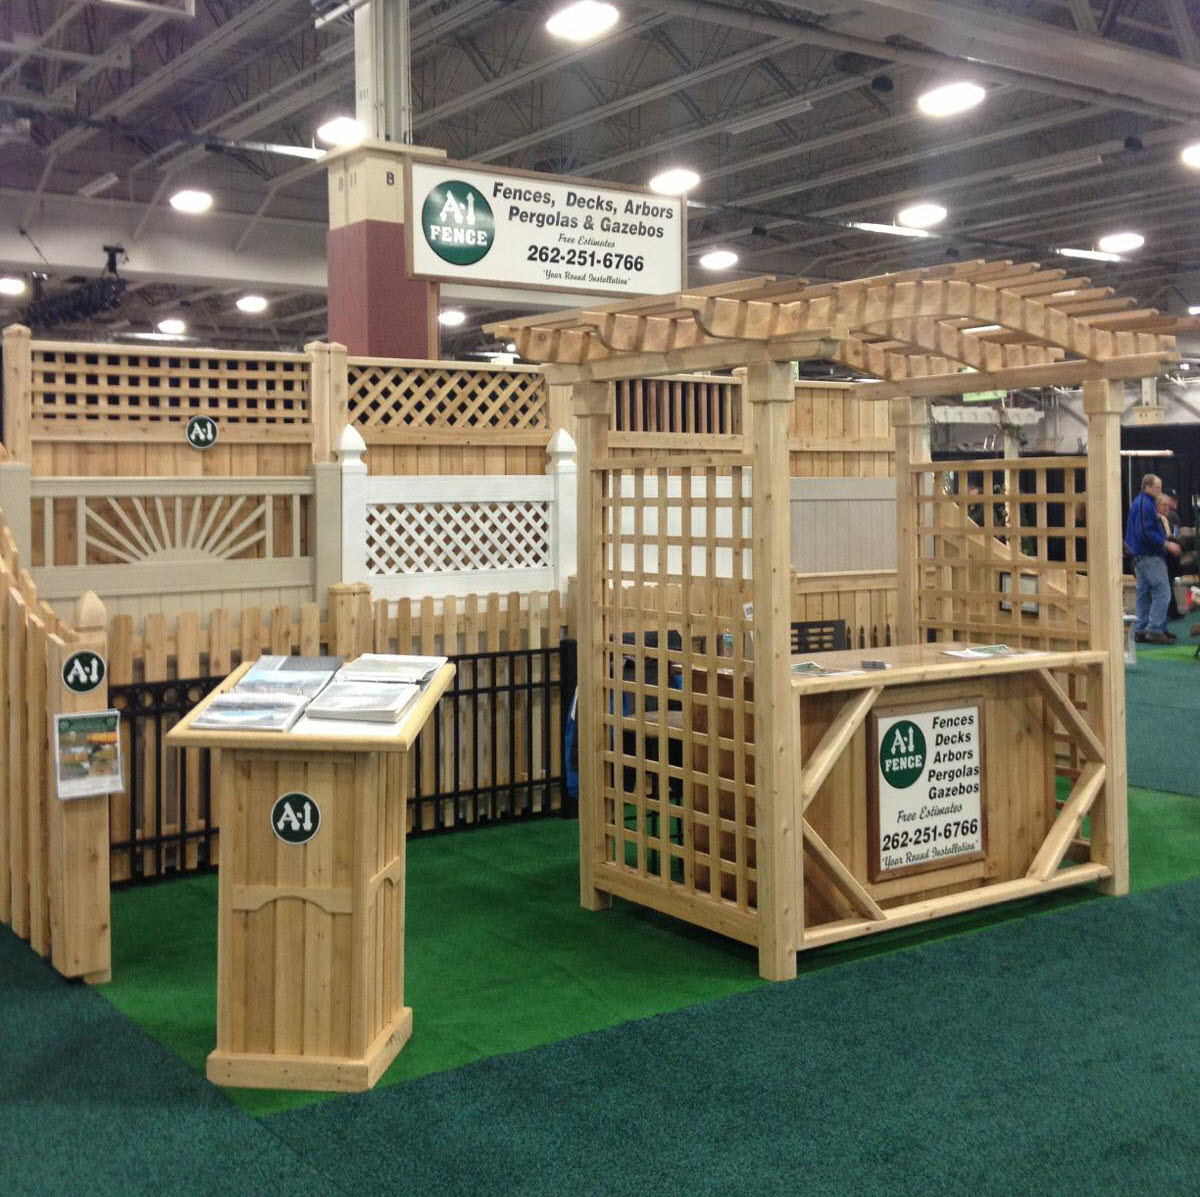 A 1 Fence Company